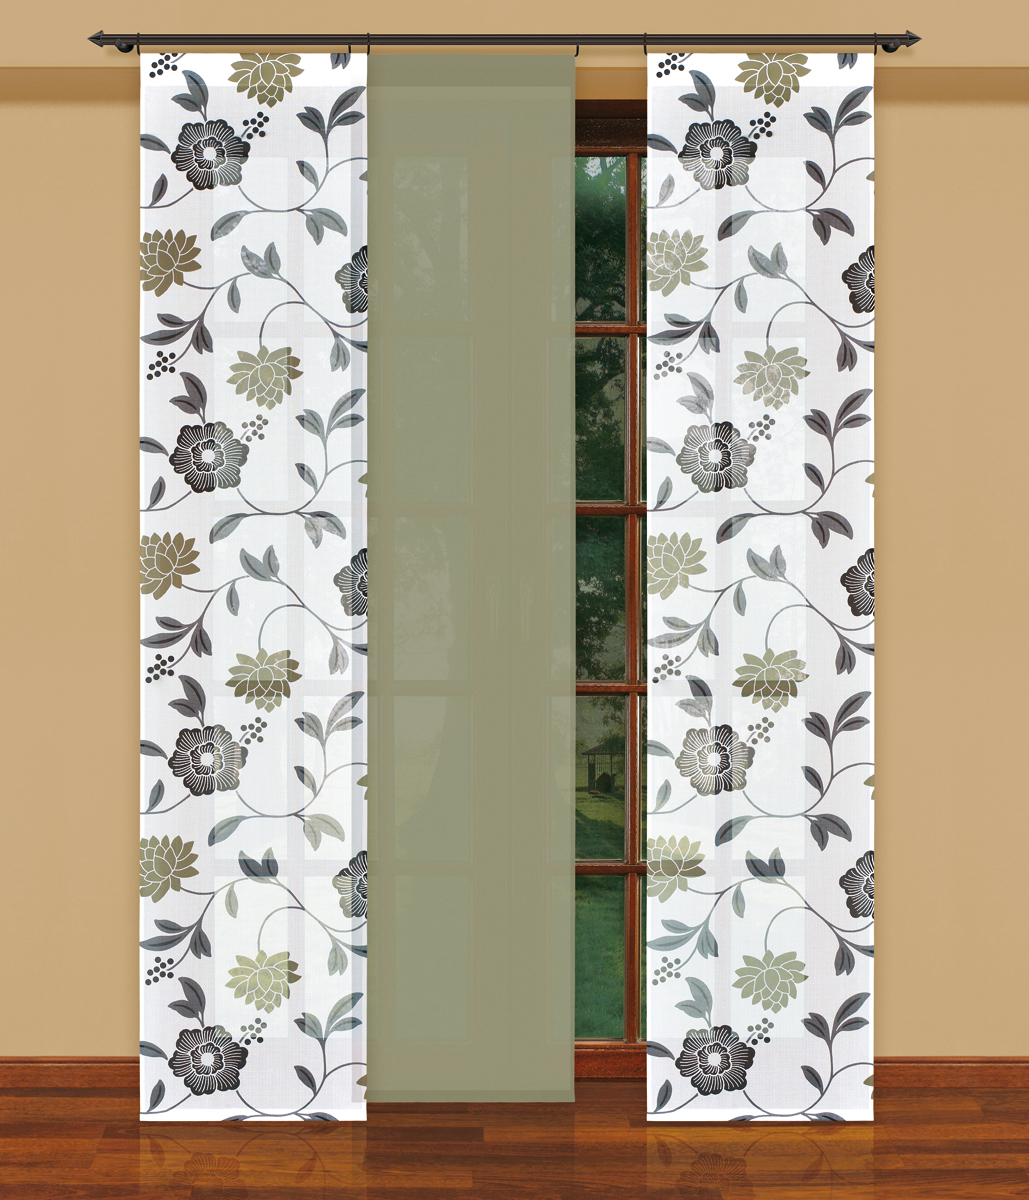 Комплект штор HAFT 250*50*3. 202240/50 темно-серыйА918Комплект штор XAFT 250*50*3. 202240/50 темно-серыйМатериал: 100% п/э, размер: 250*50*3, цвет: темно-серый